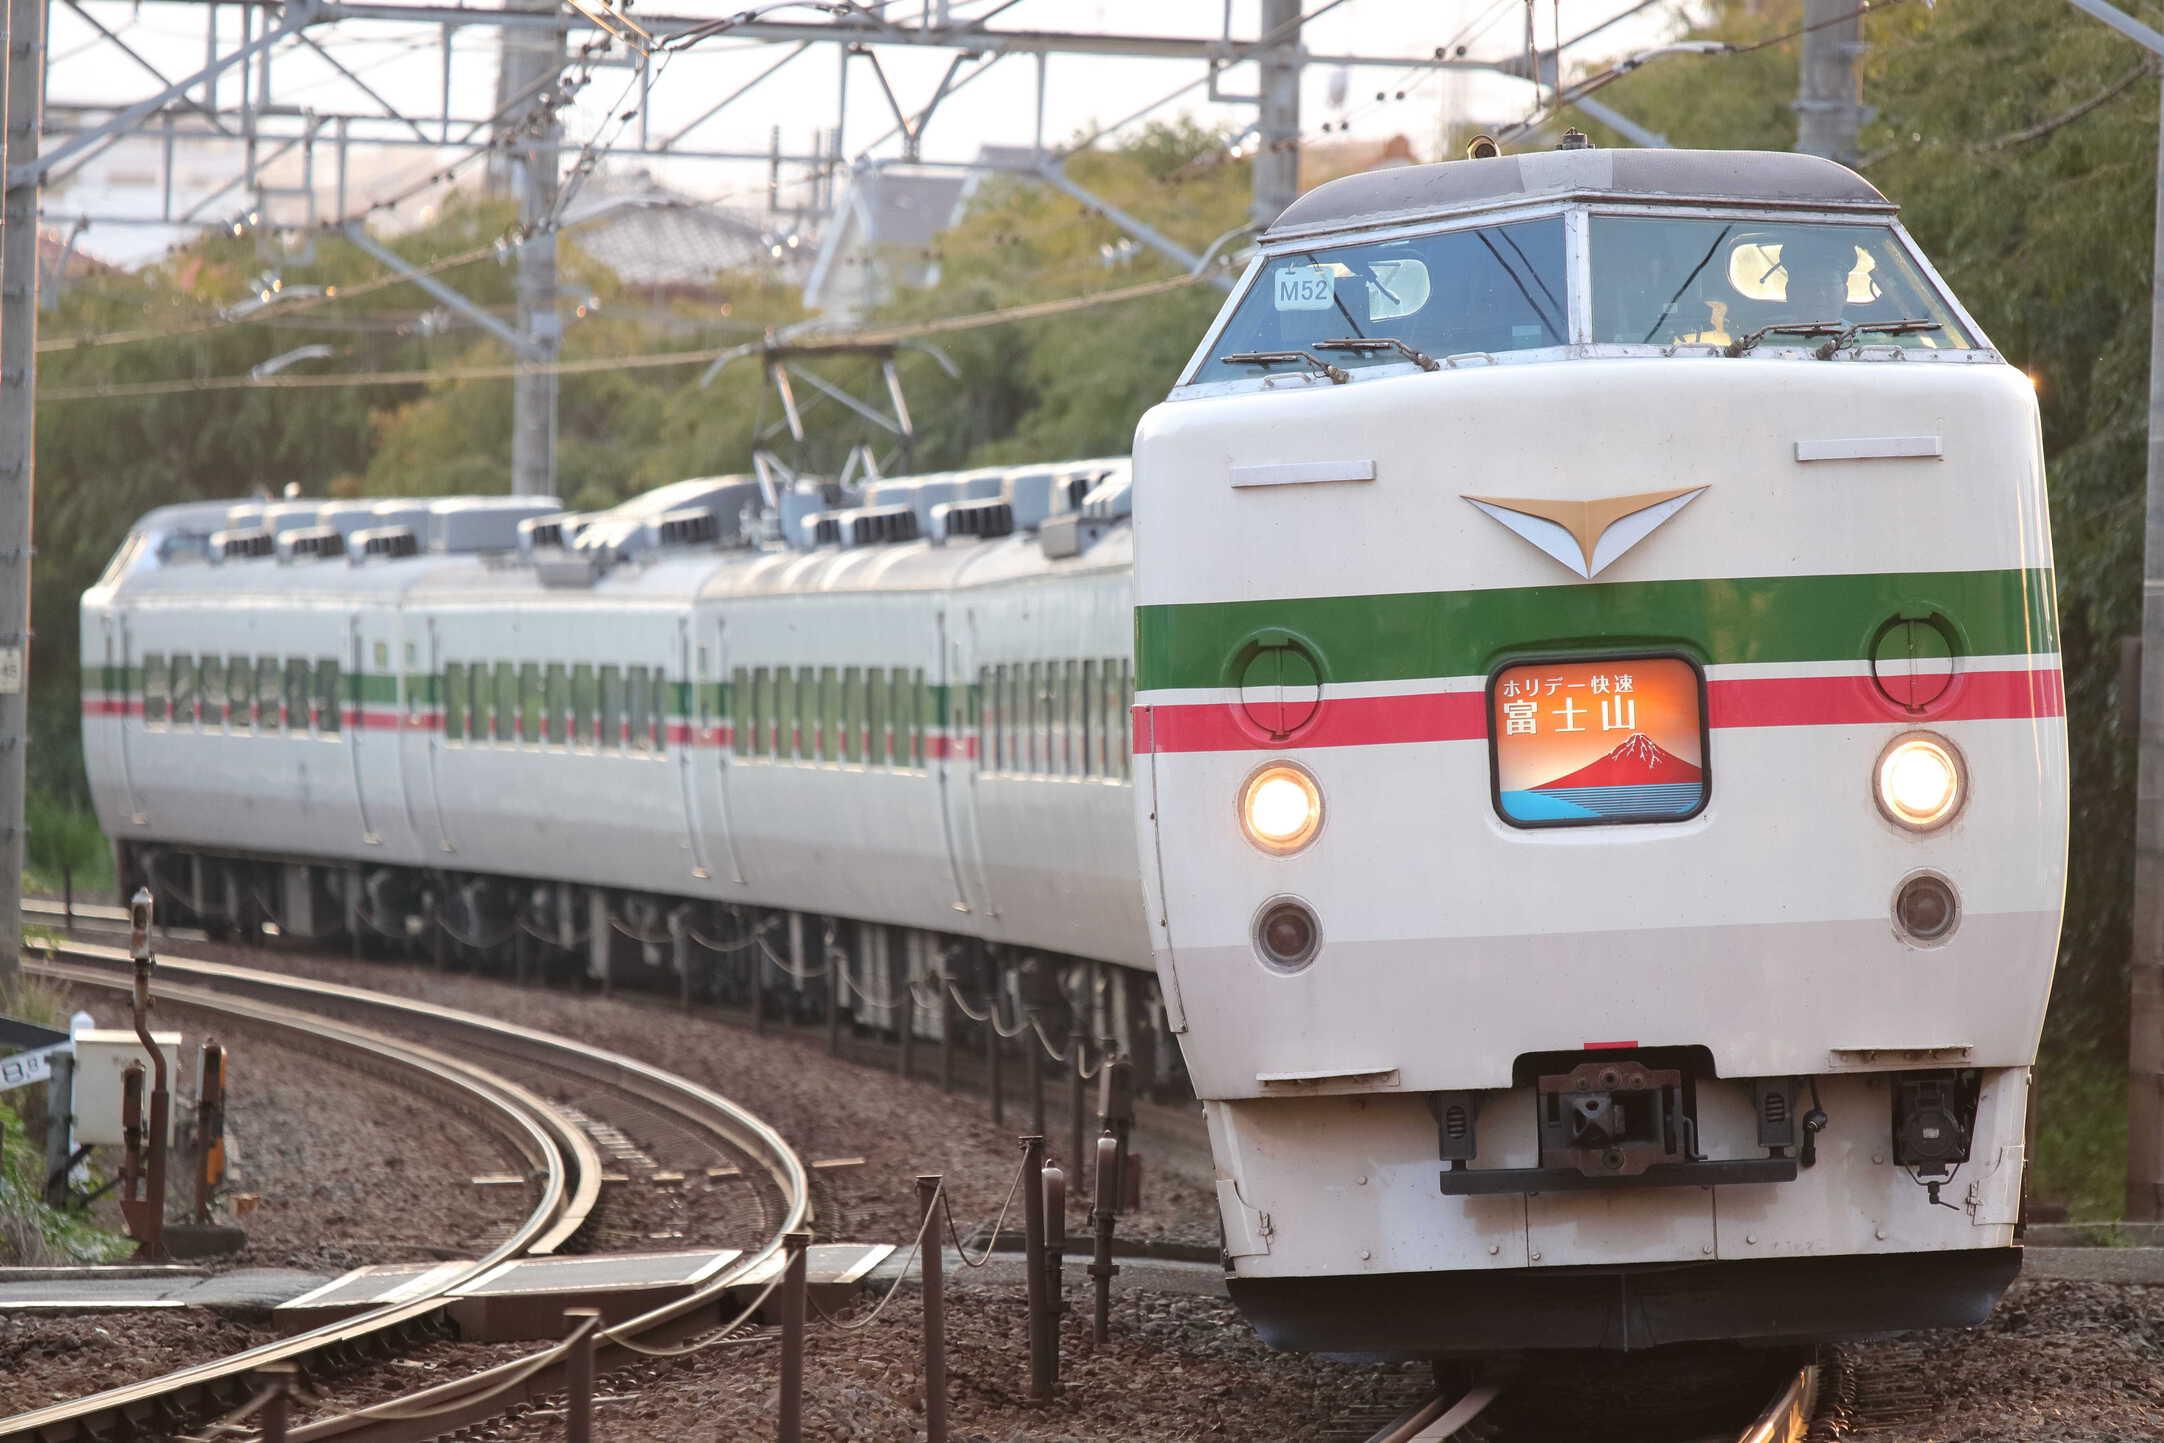 8570M 快速 ホリデー快速富士山2号 189系 八トタM52編成